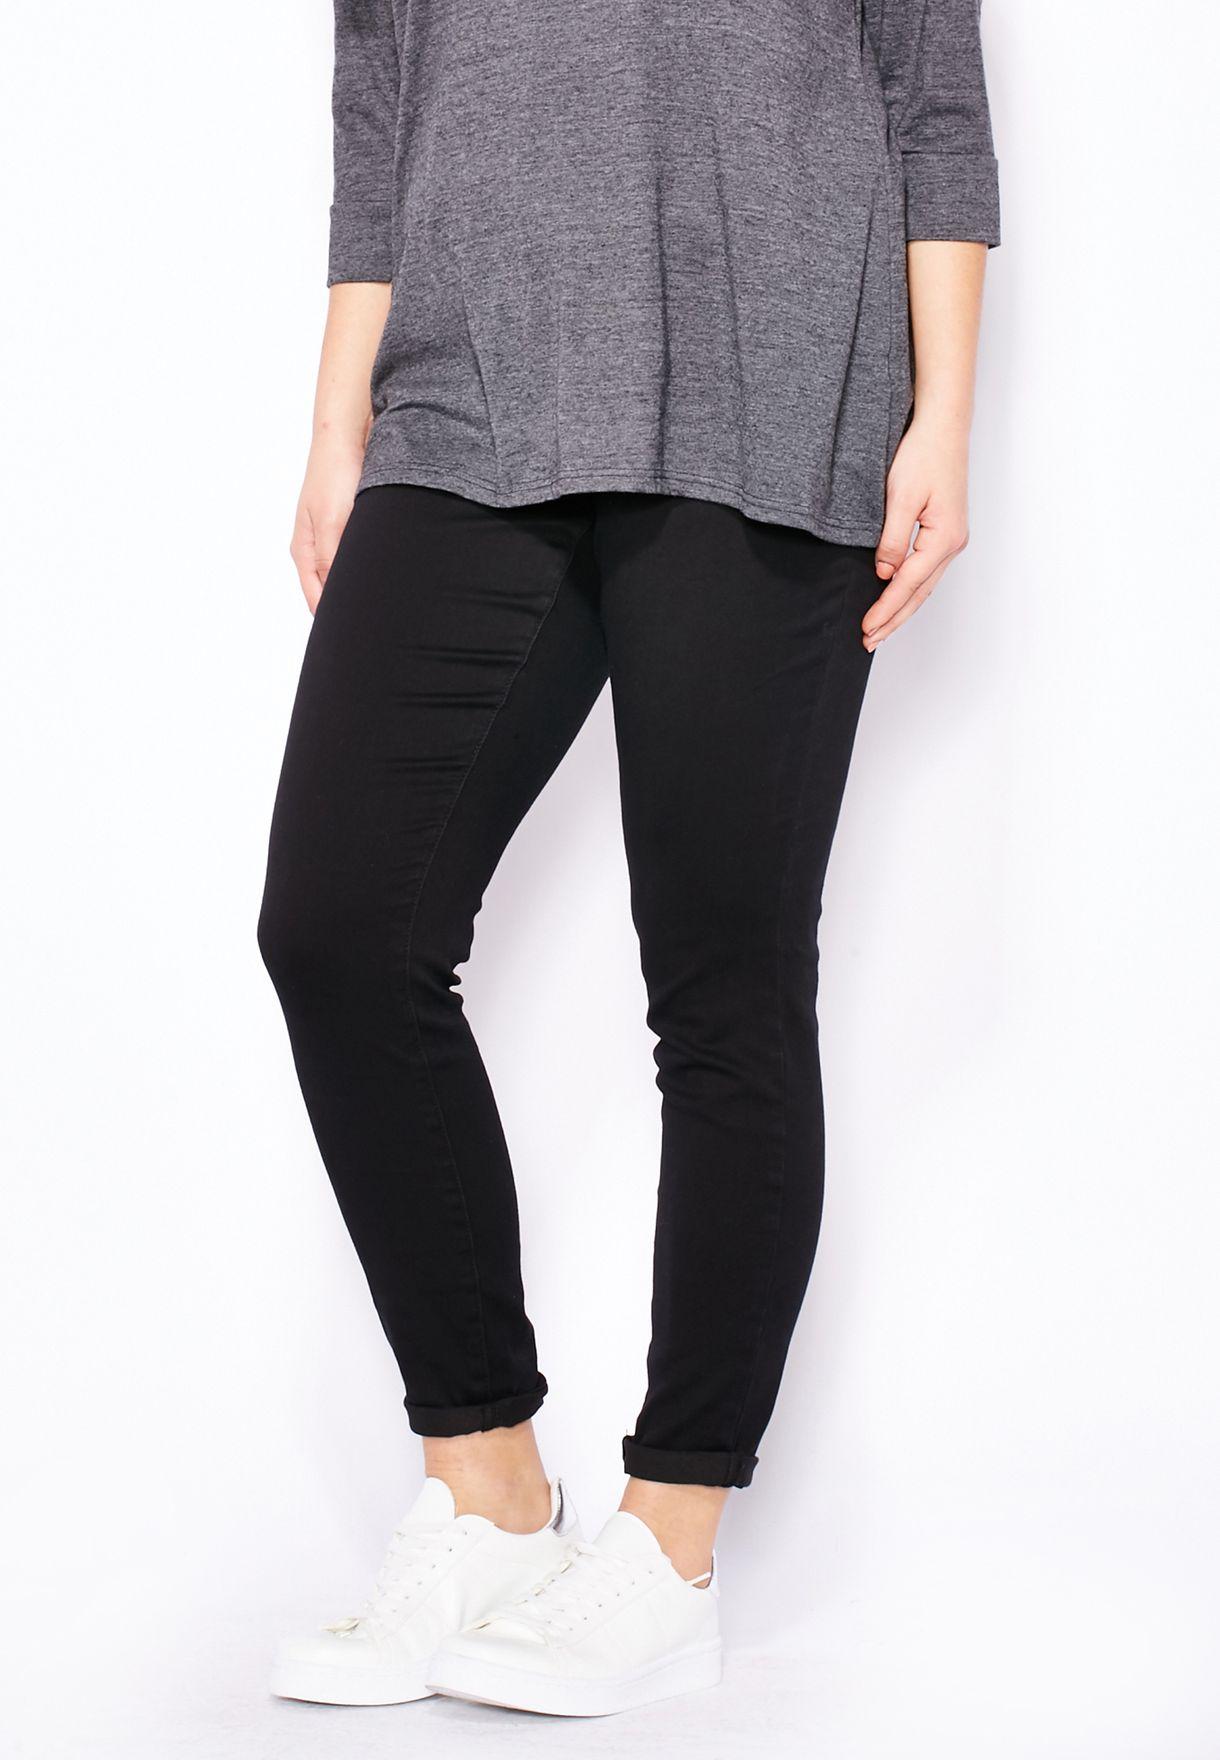 e88464798dbd0 Shop Evans black Skinny Jeans for Women in Kuwait - EV855AT76TGP